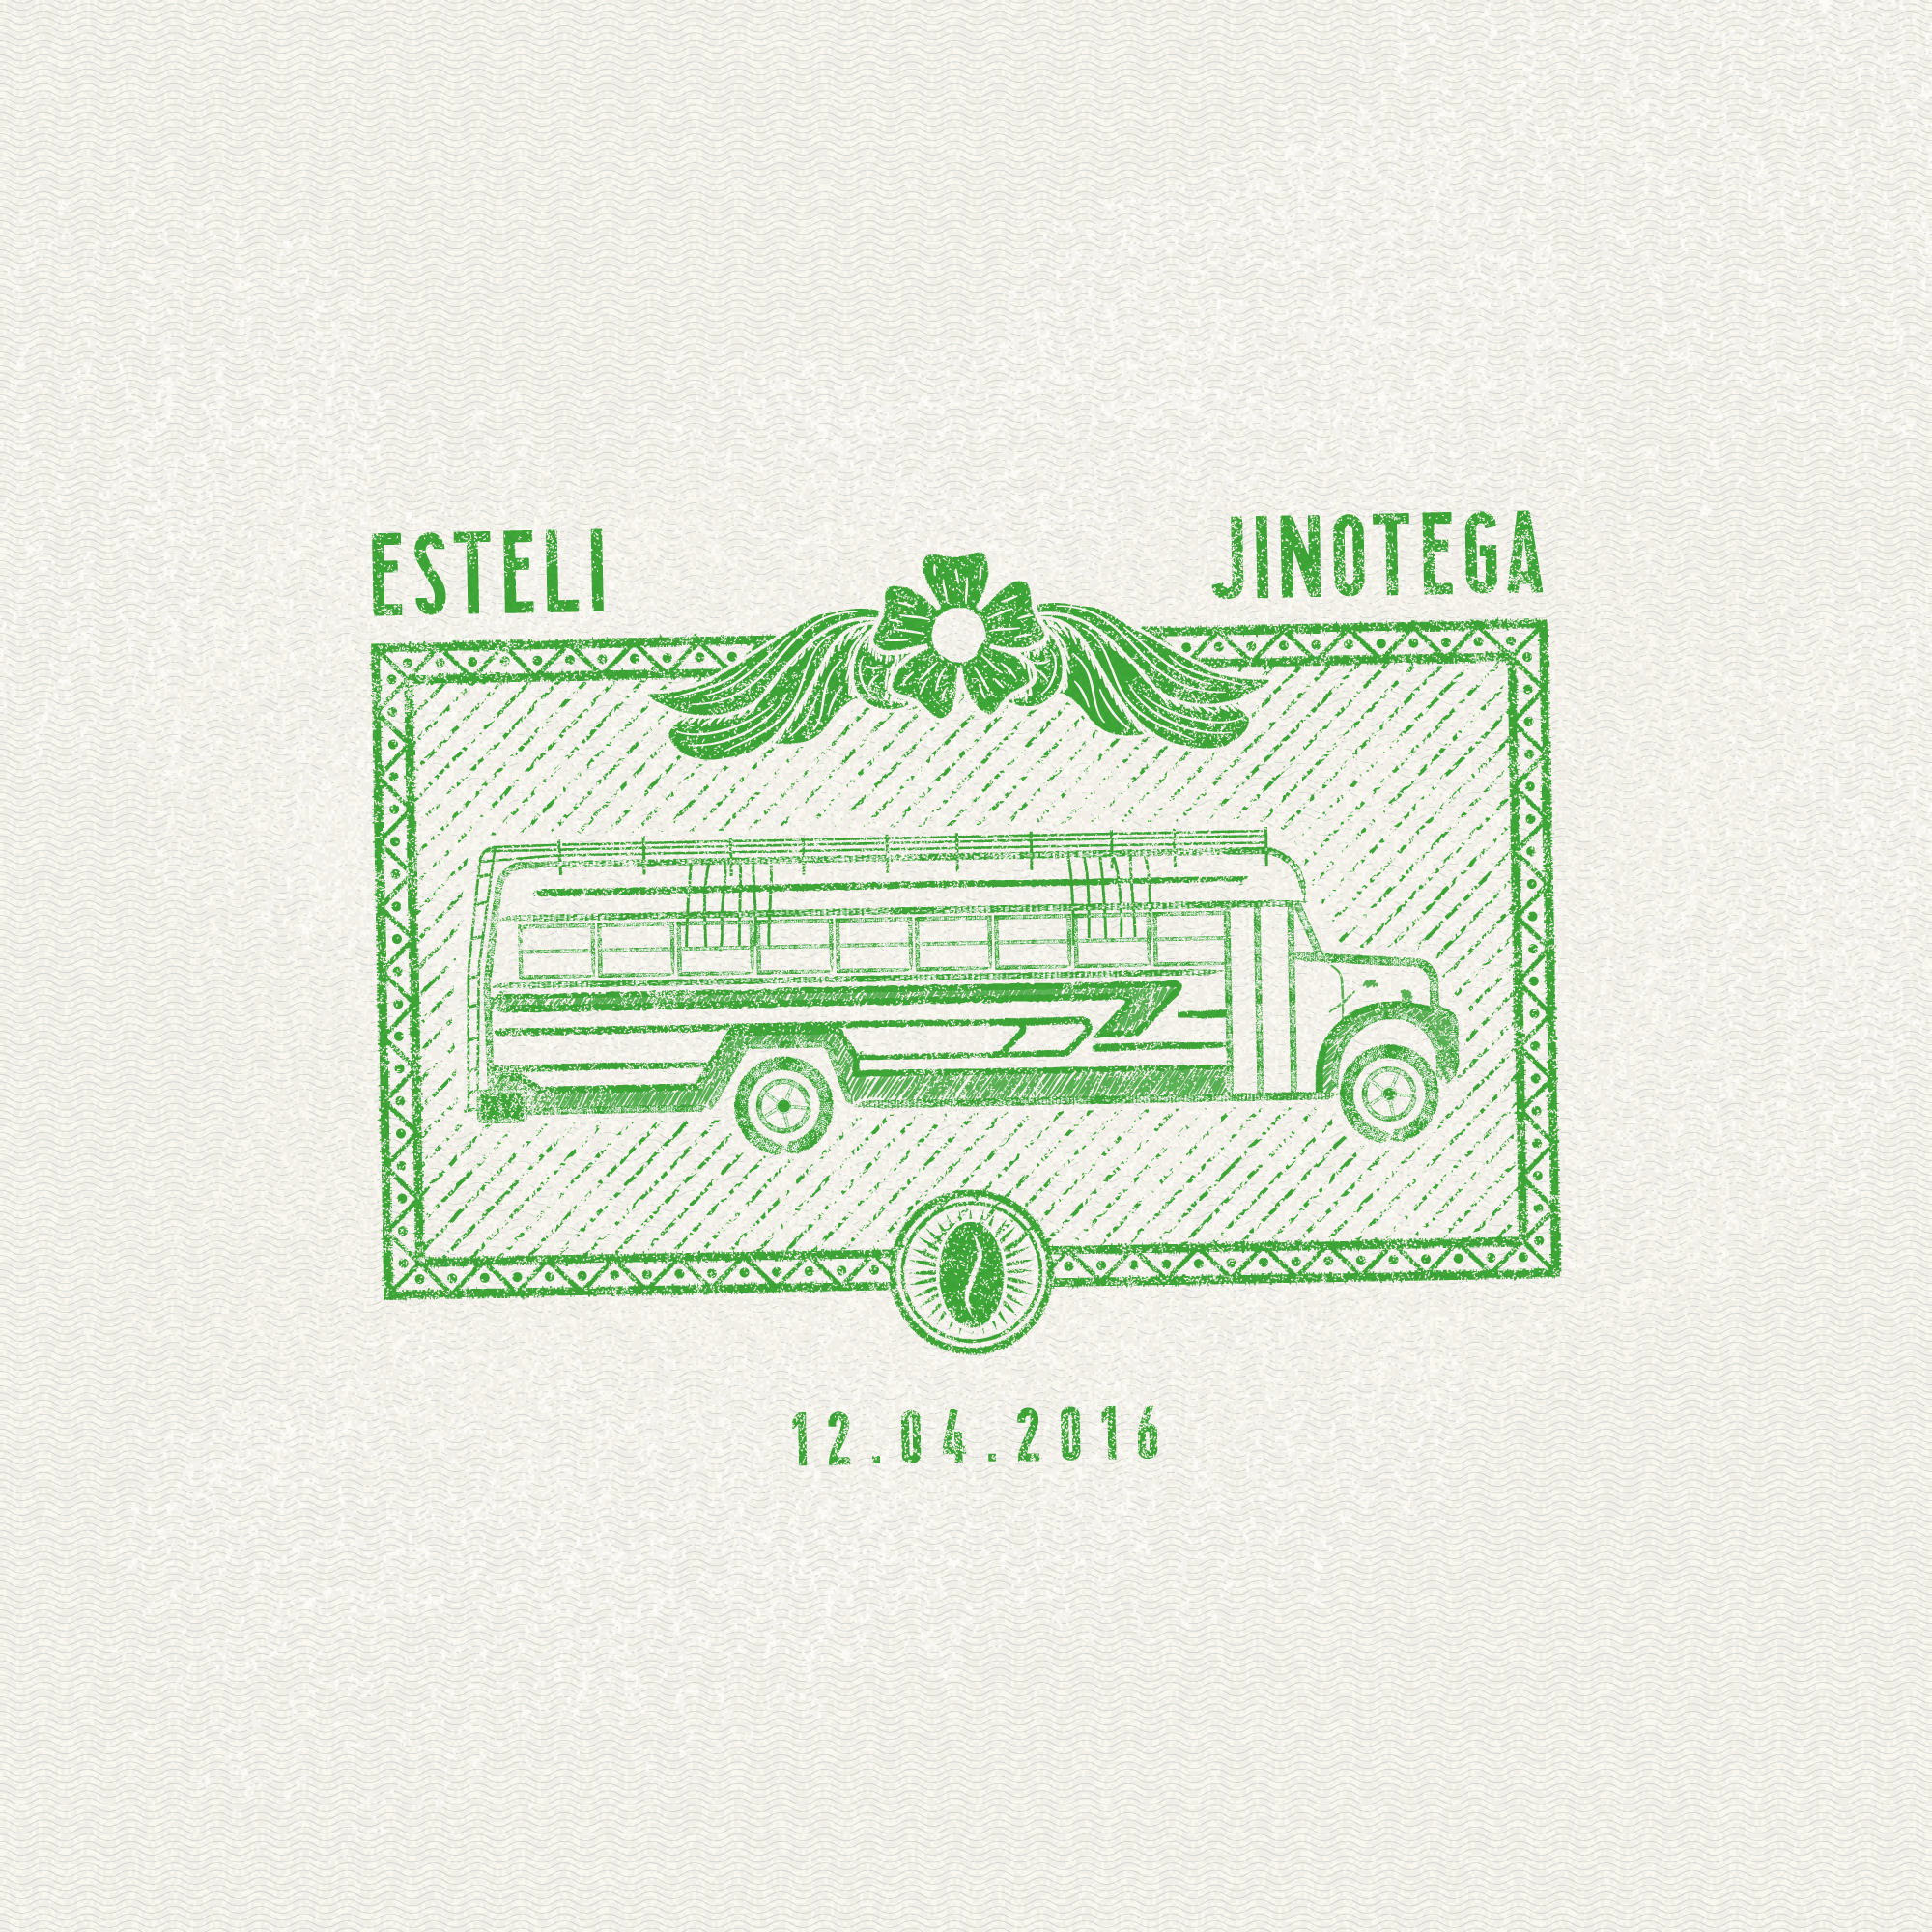 Nicaragua chicken bus passport stamp